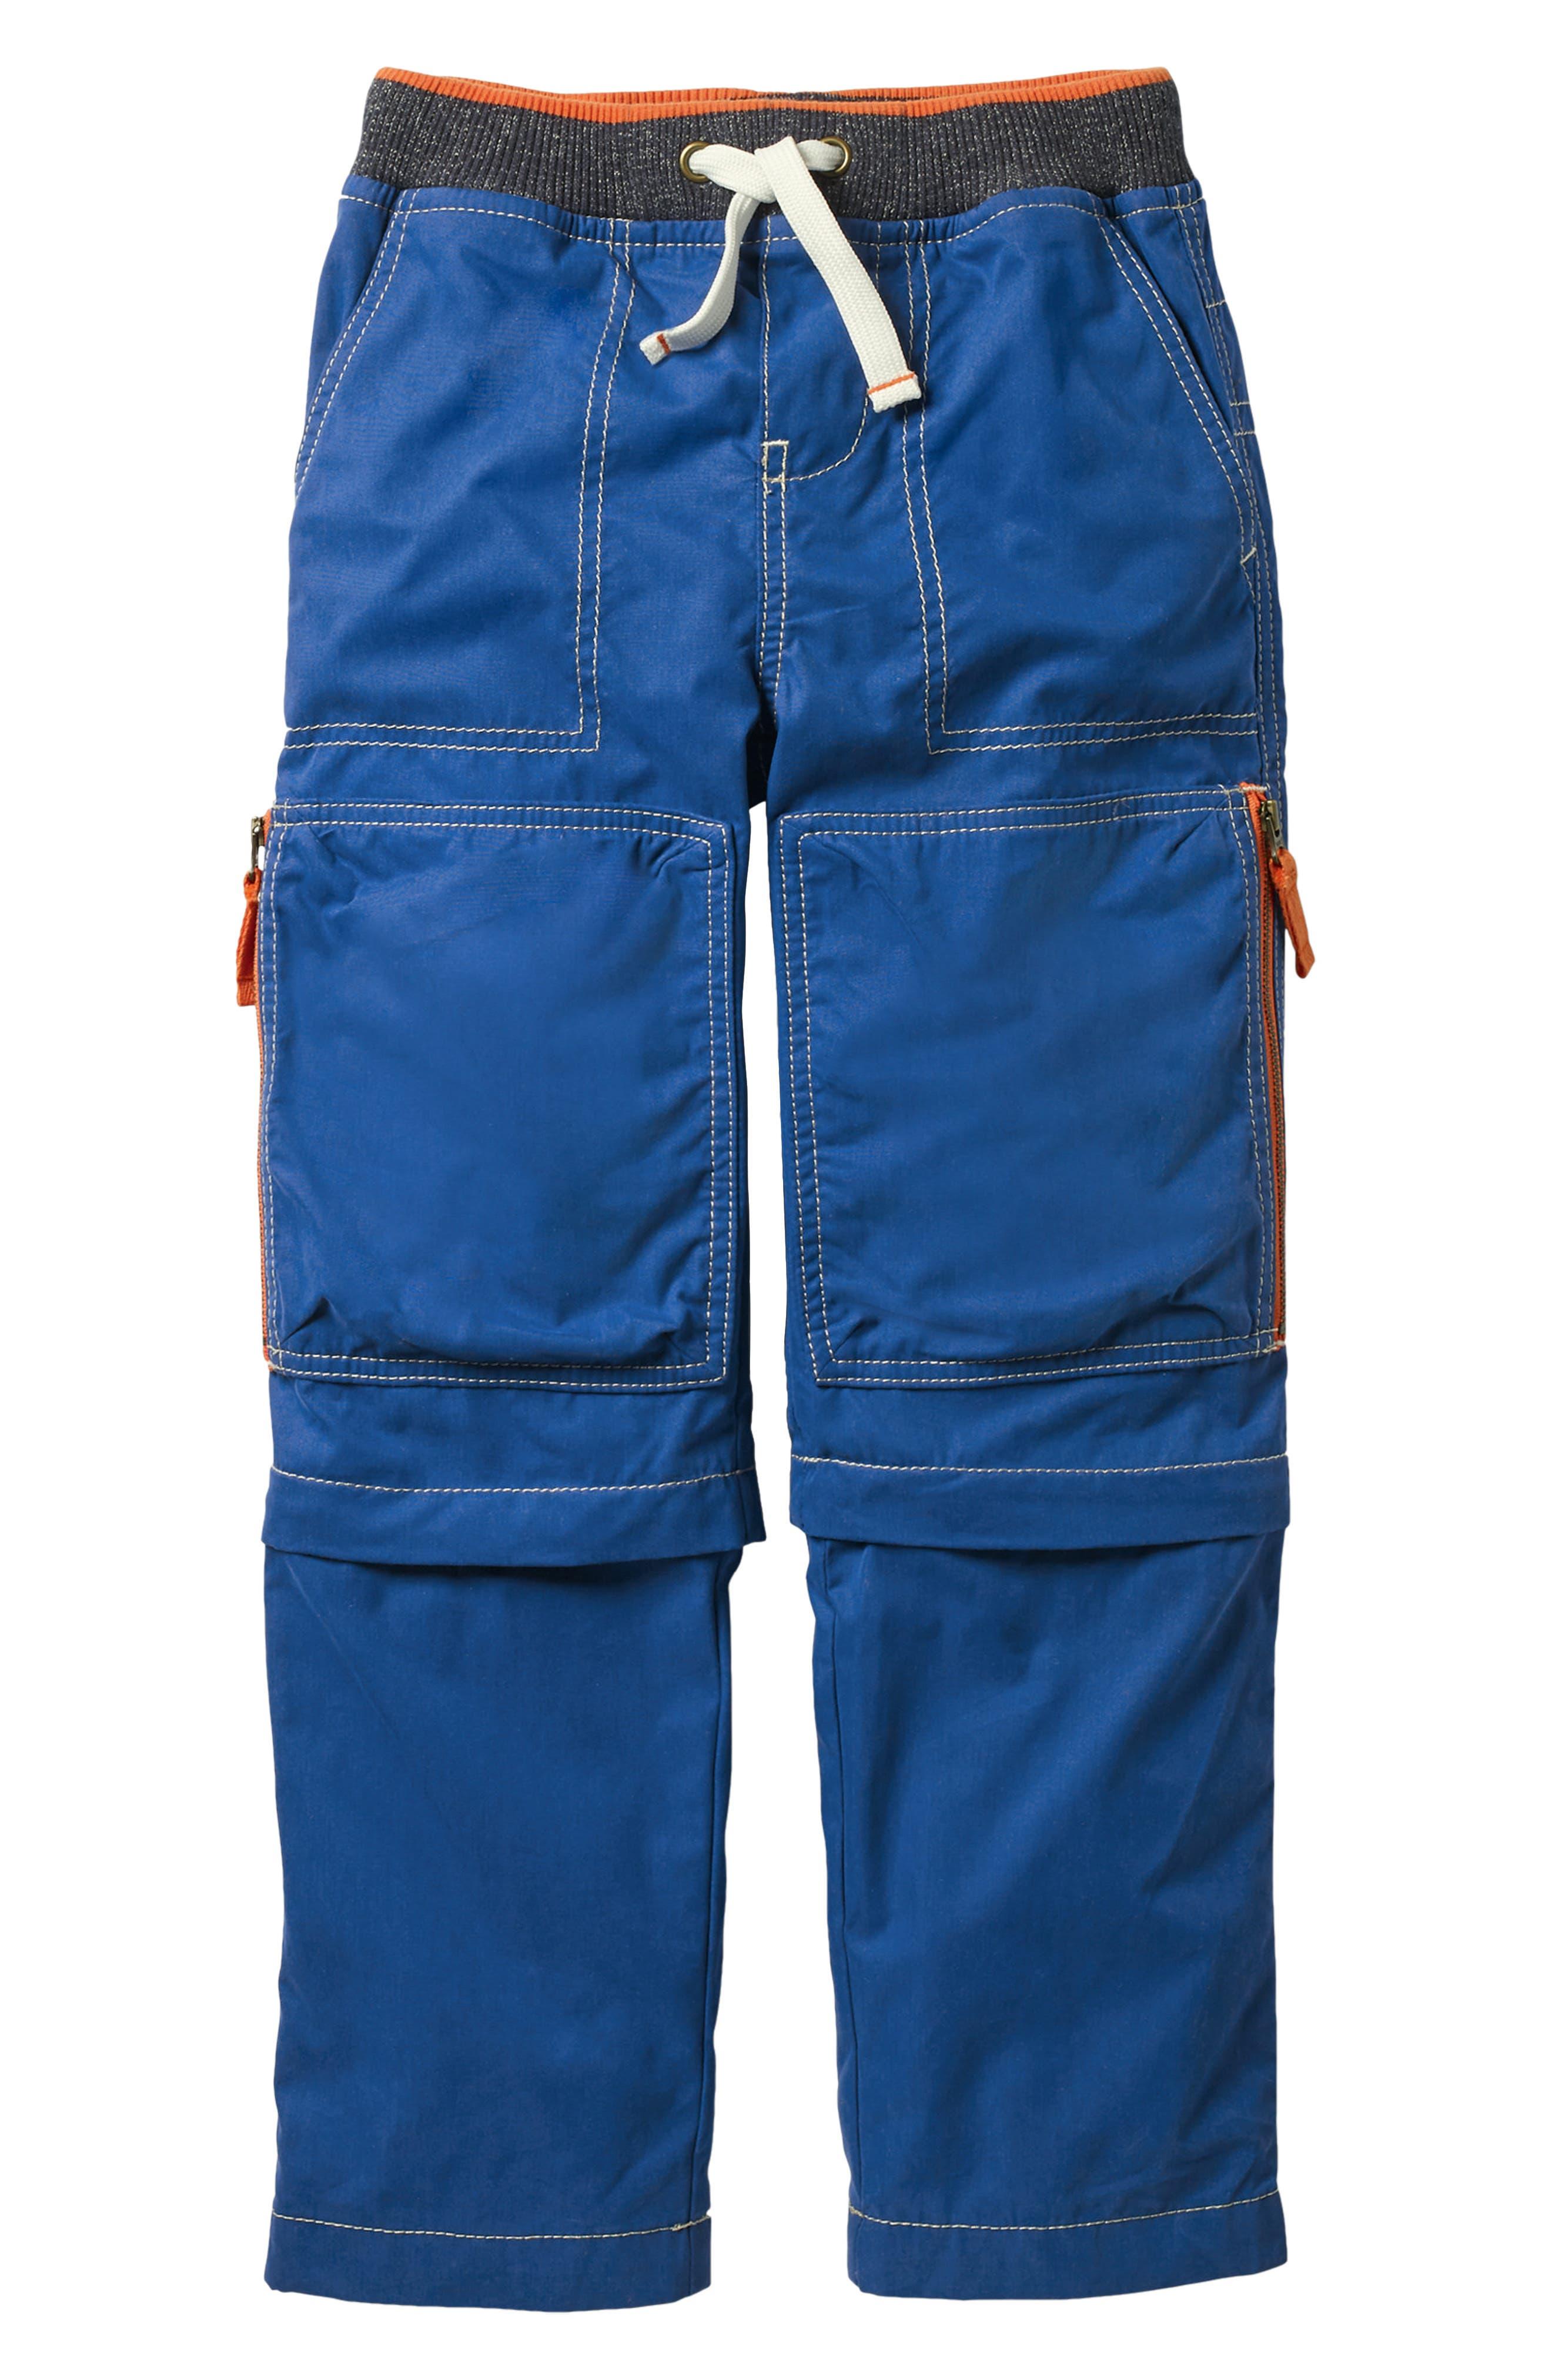 Techno Convertible Zip Off Pants,                         Main,                         color, Orion Blue